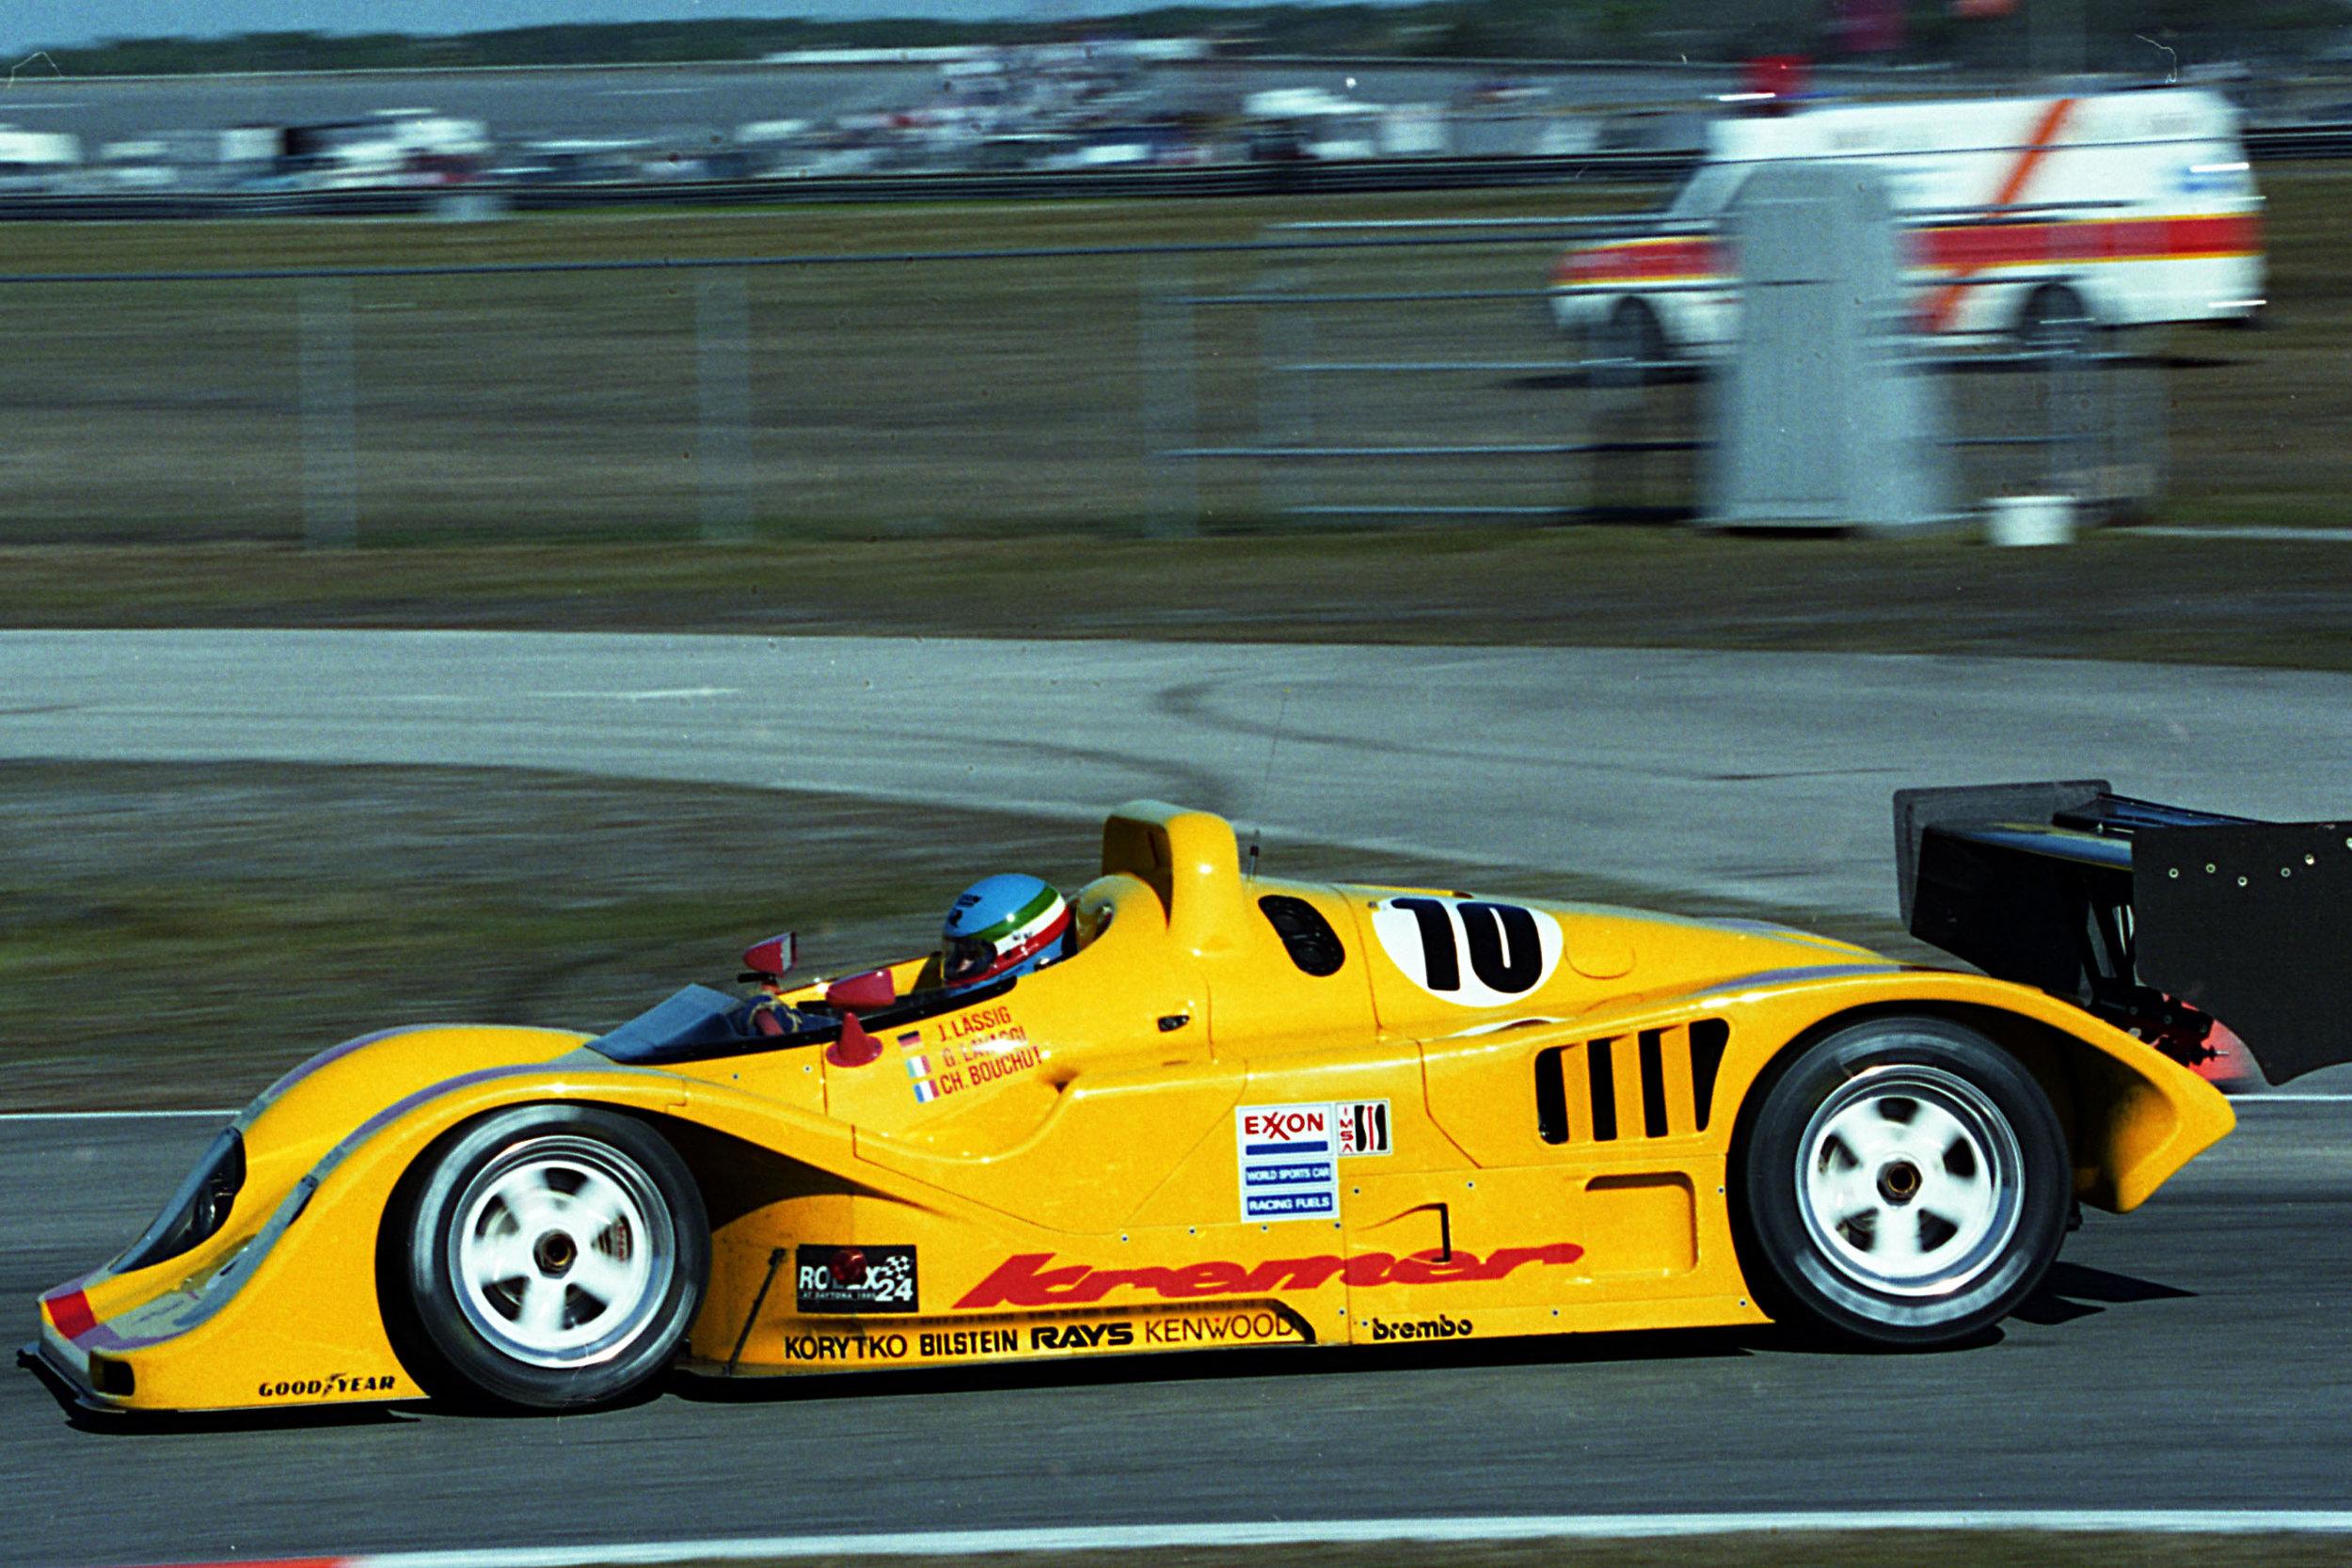 Giovanni Lavaggi on his way to the win, Daytona 1995.